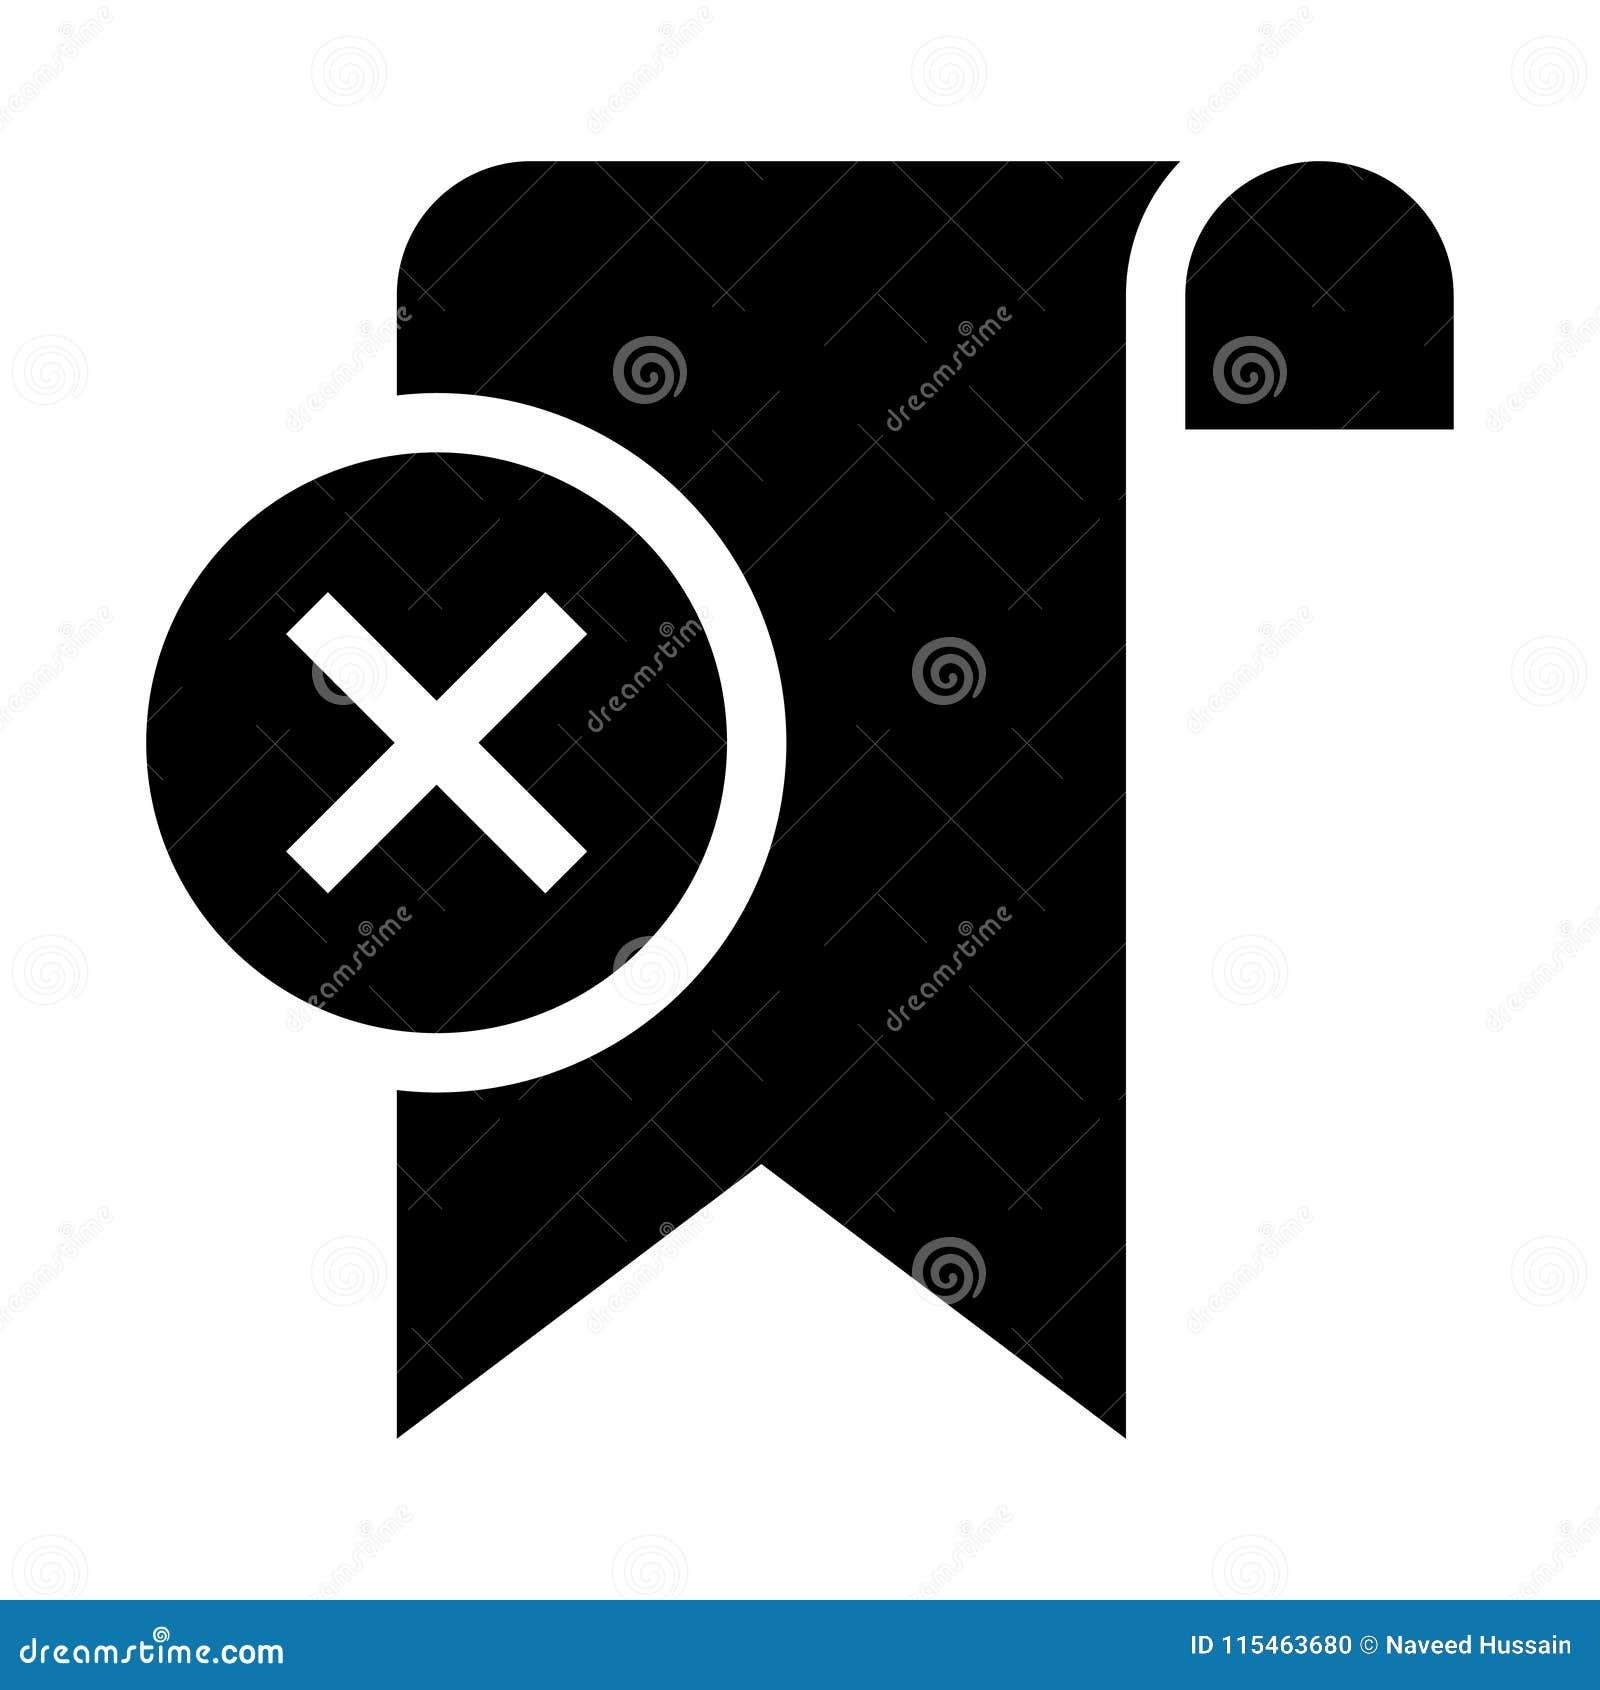 De referentie schrapt glyphs pictogram